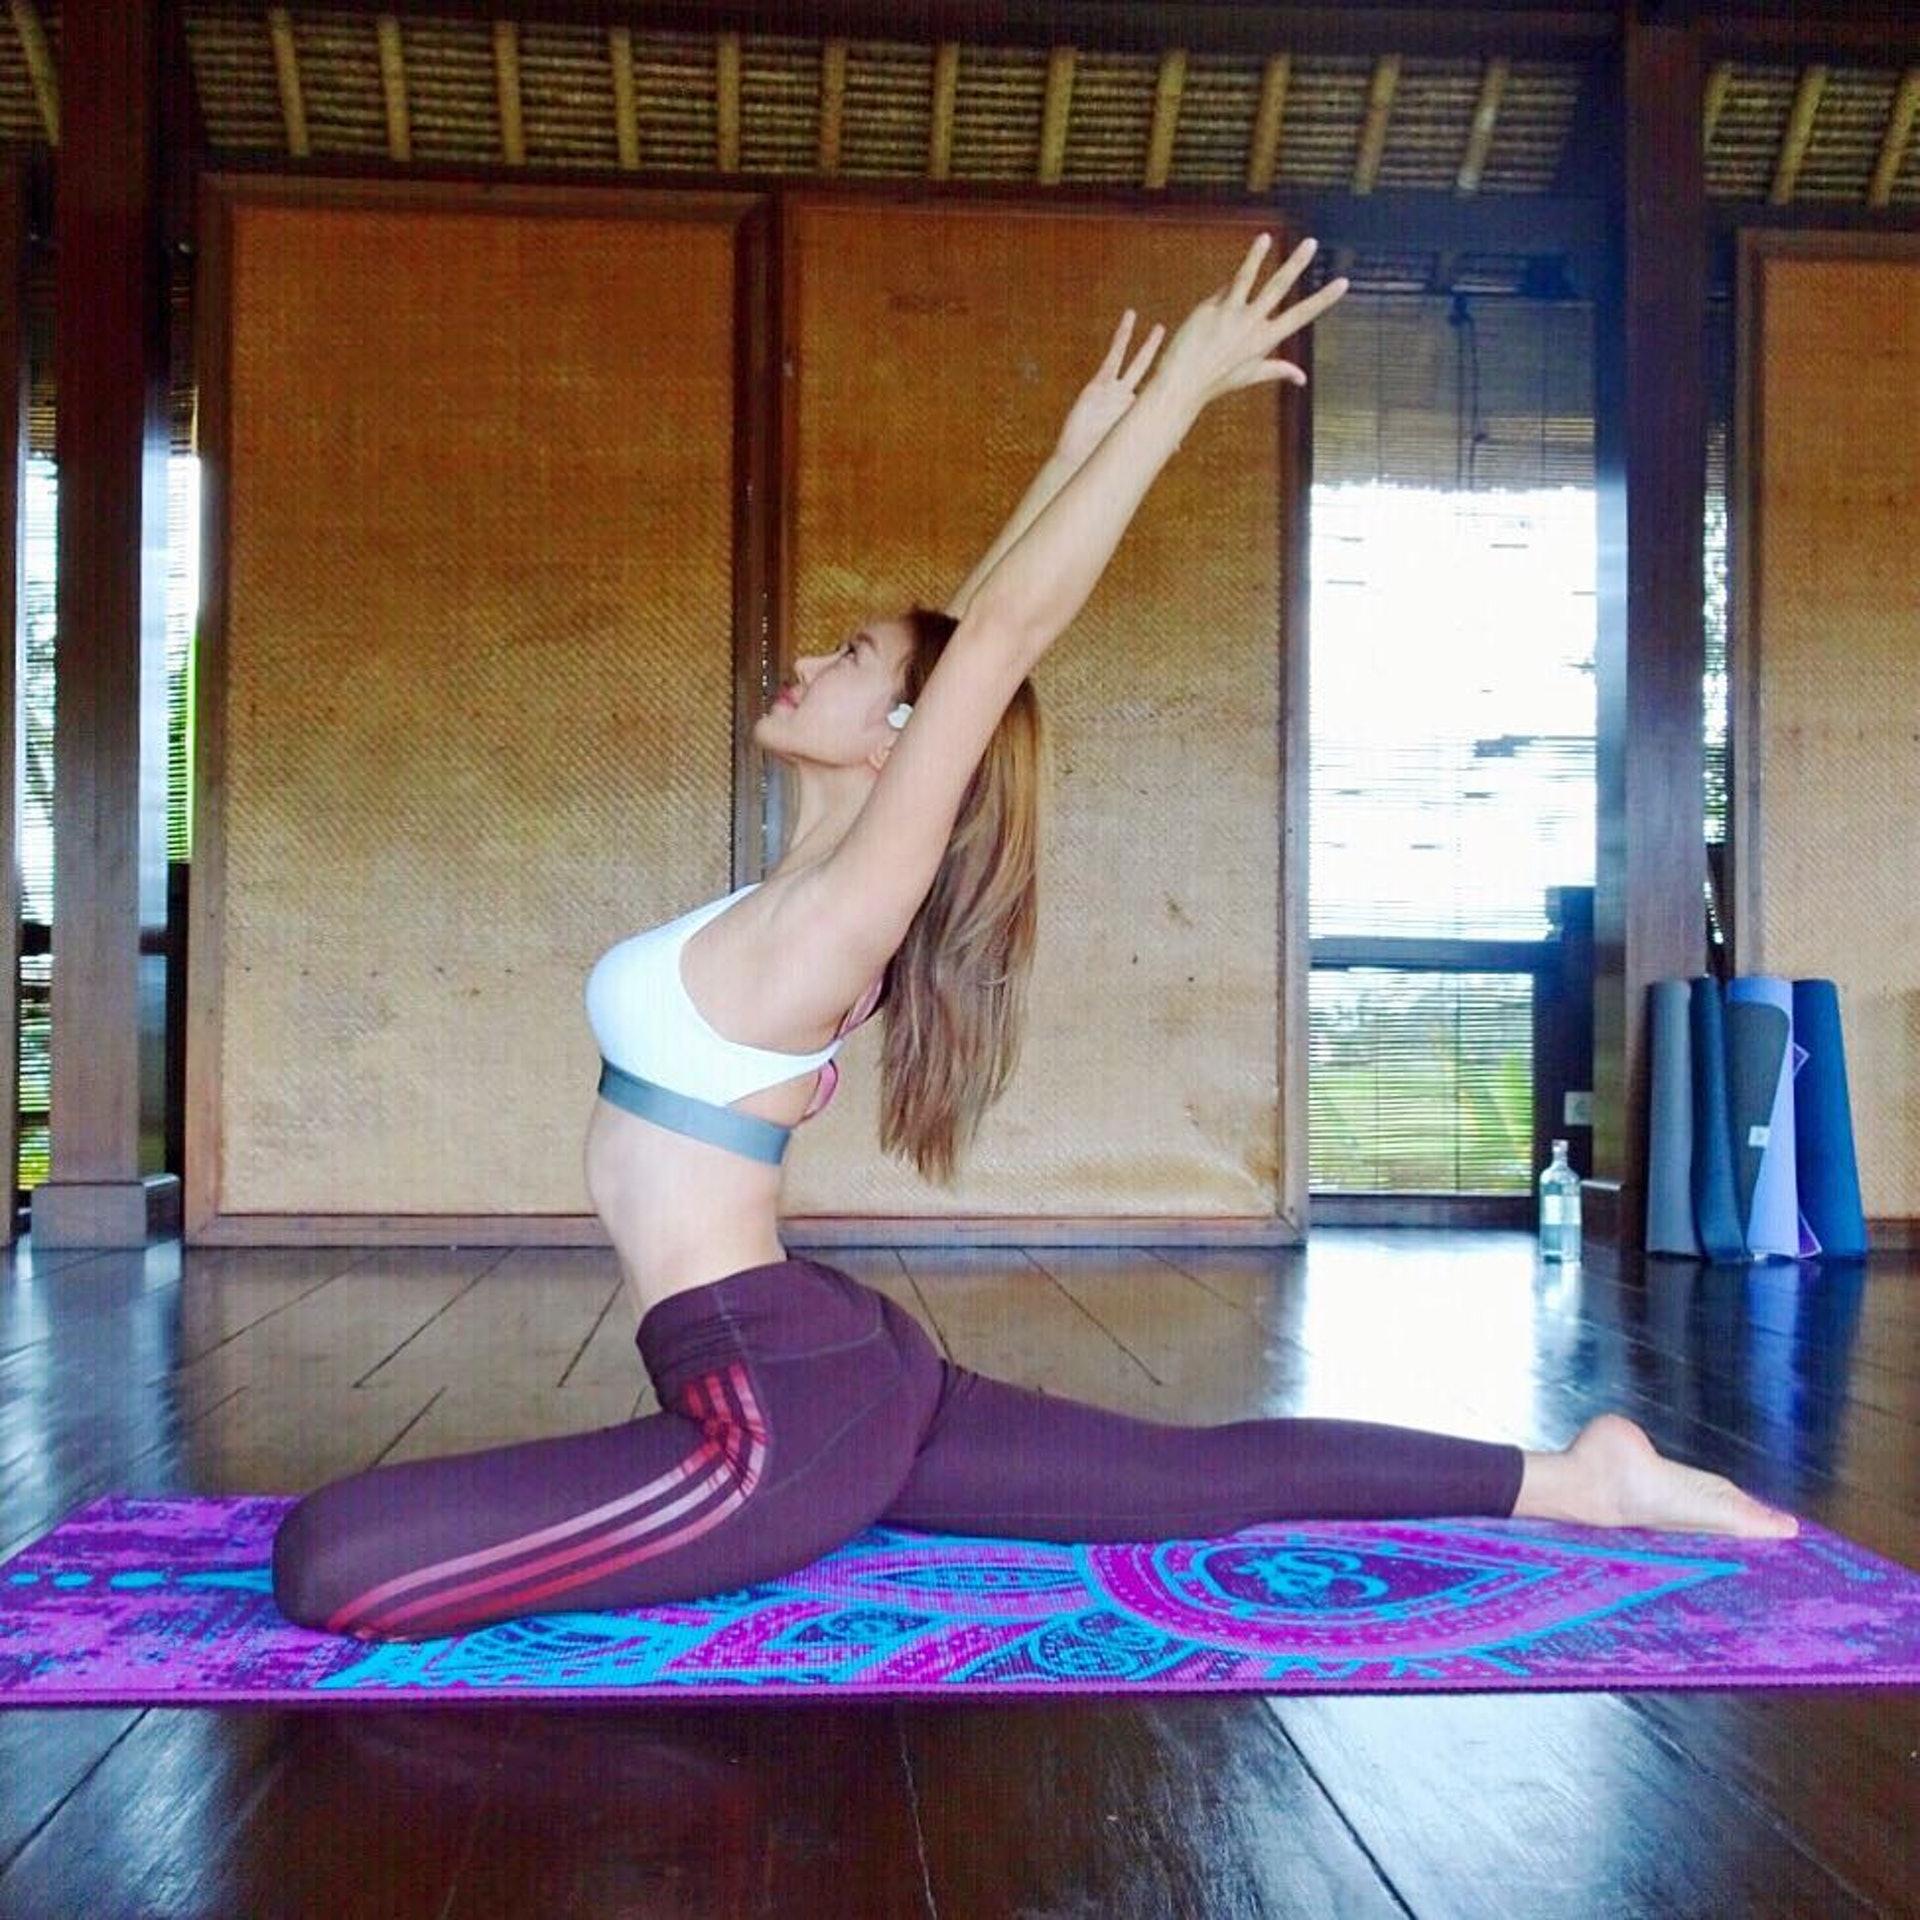 Bonnie經常做瑜伽保持健康體態身材。(圖片IG:Bonnieschan)